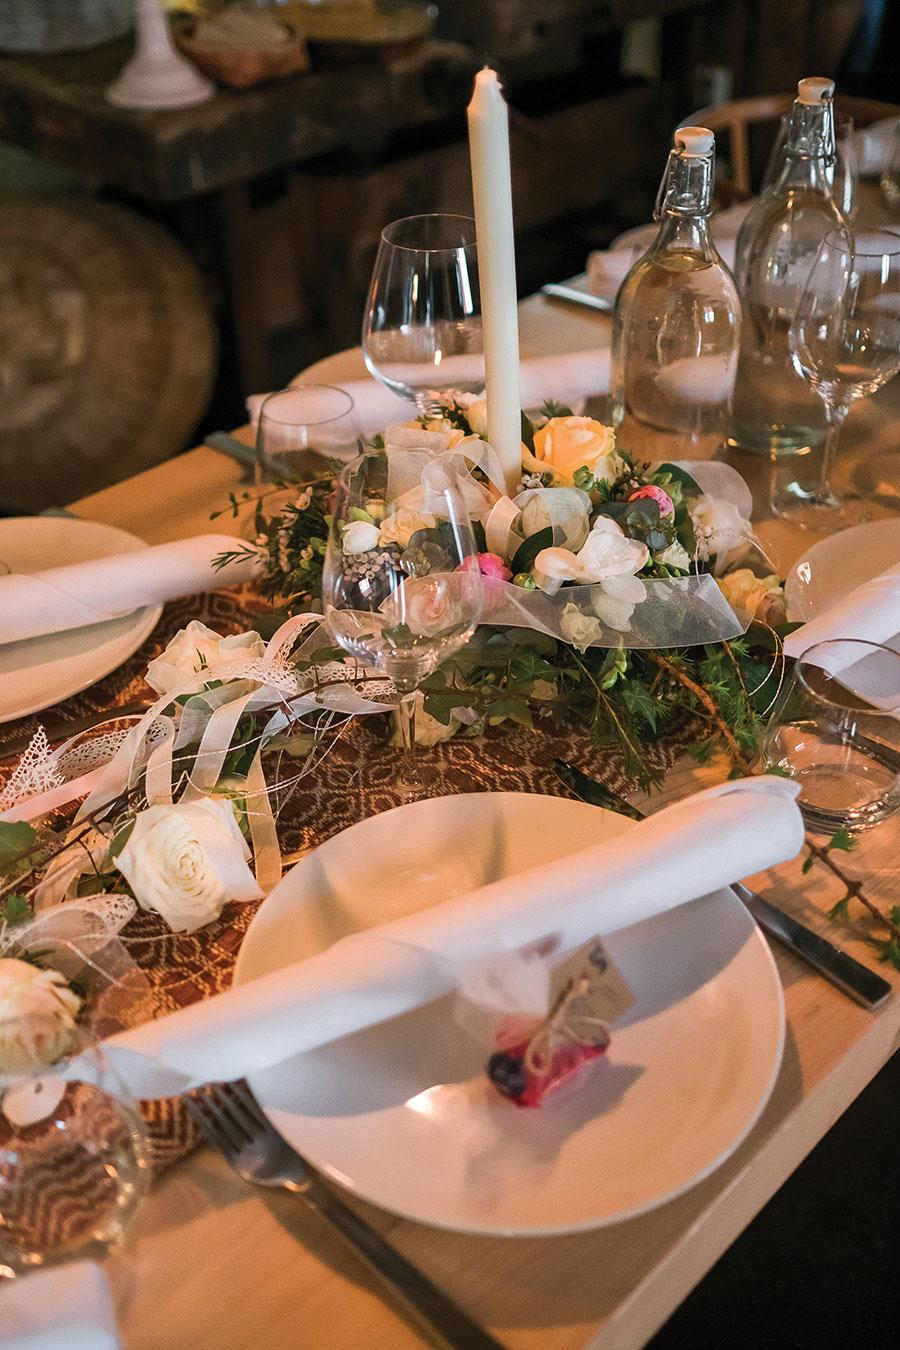 breathtaking-scenic-wedding-in-norway20160914_0124